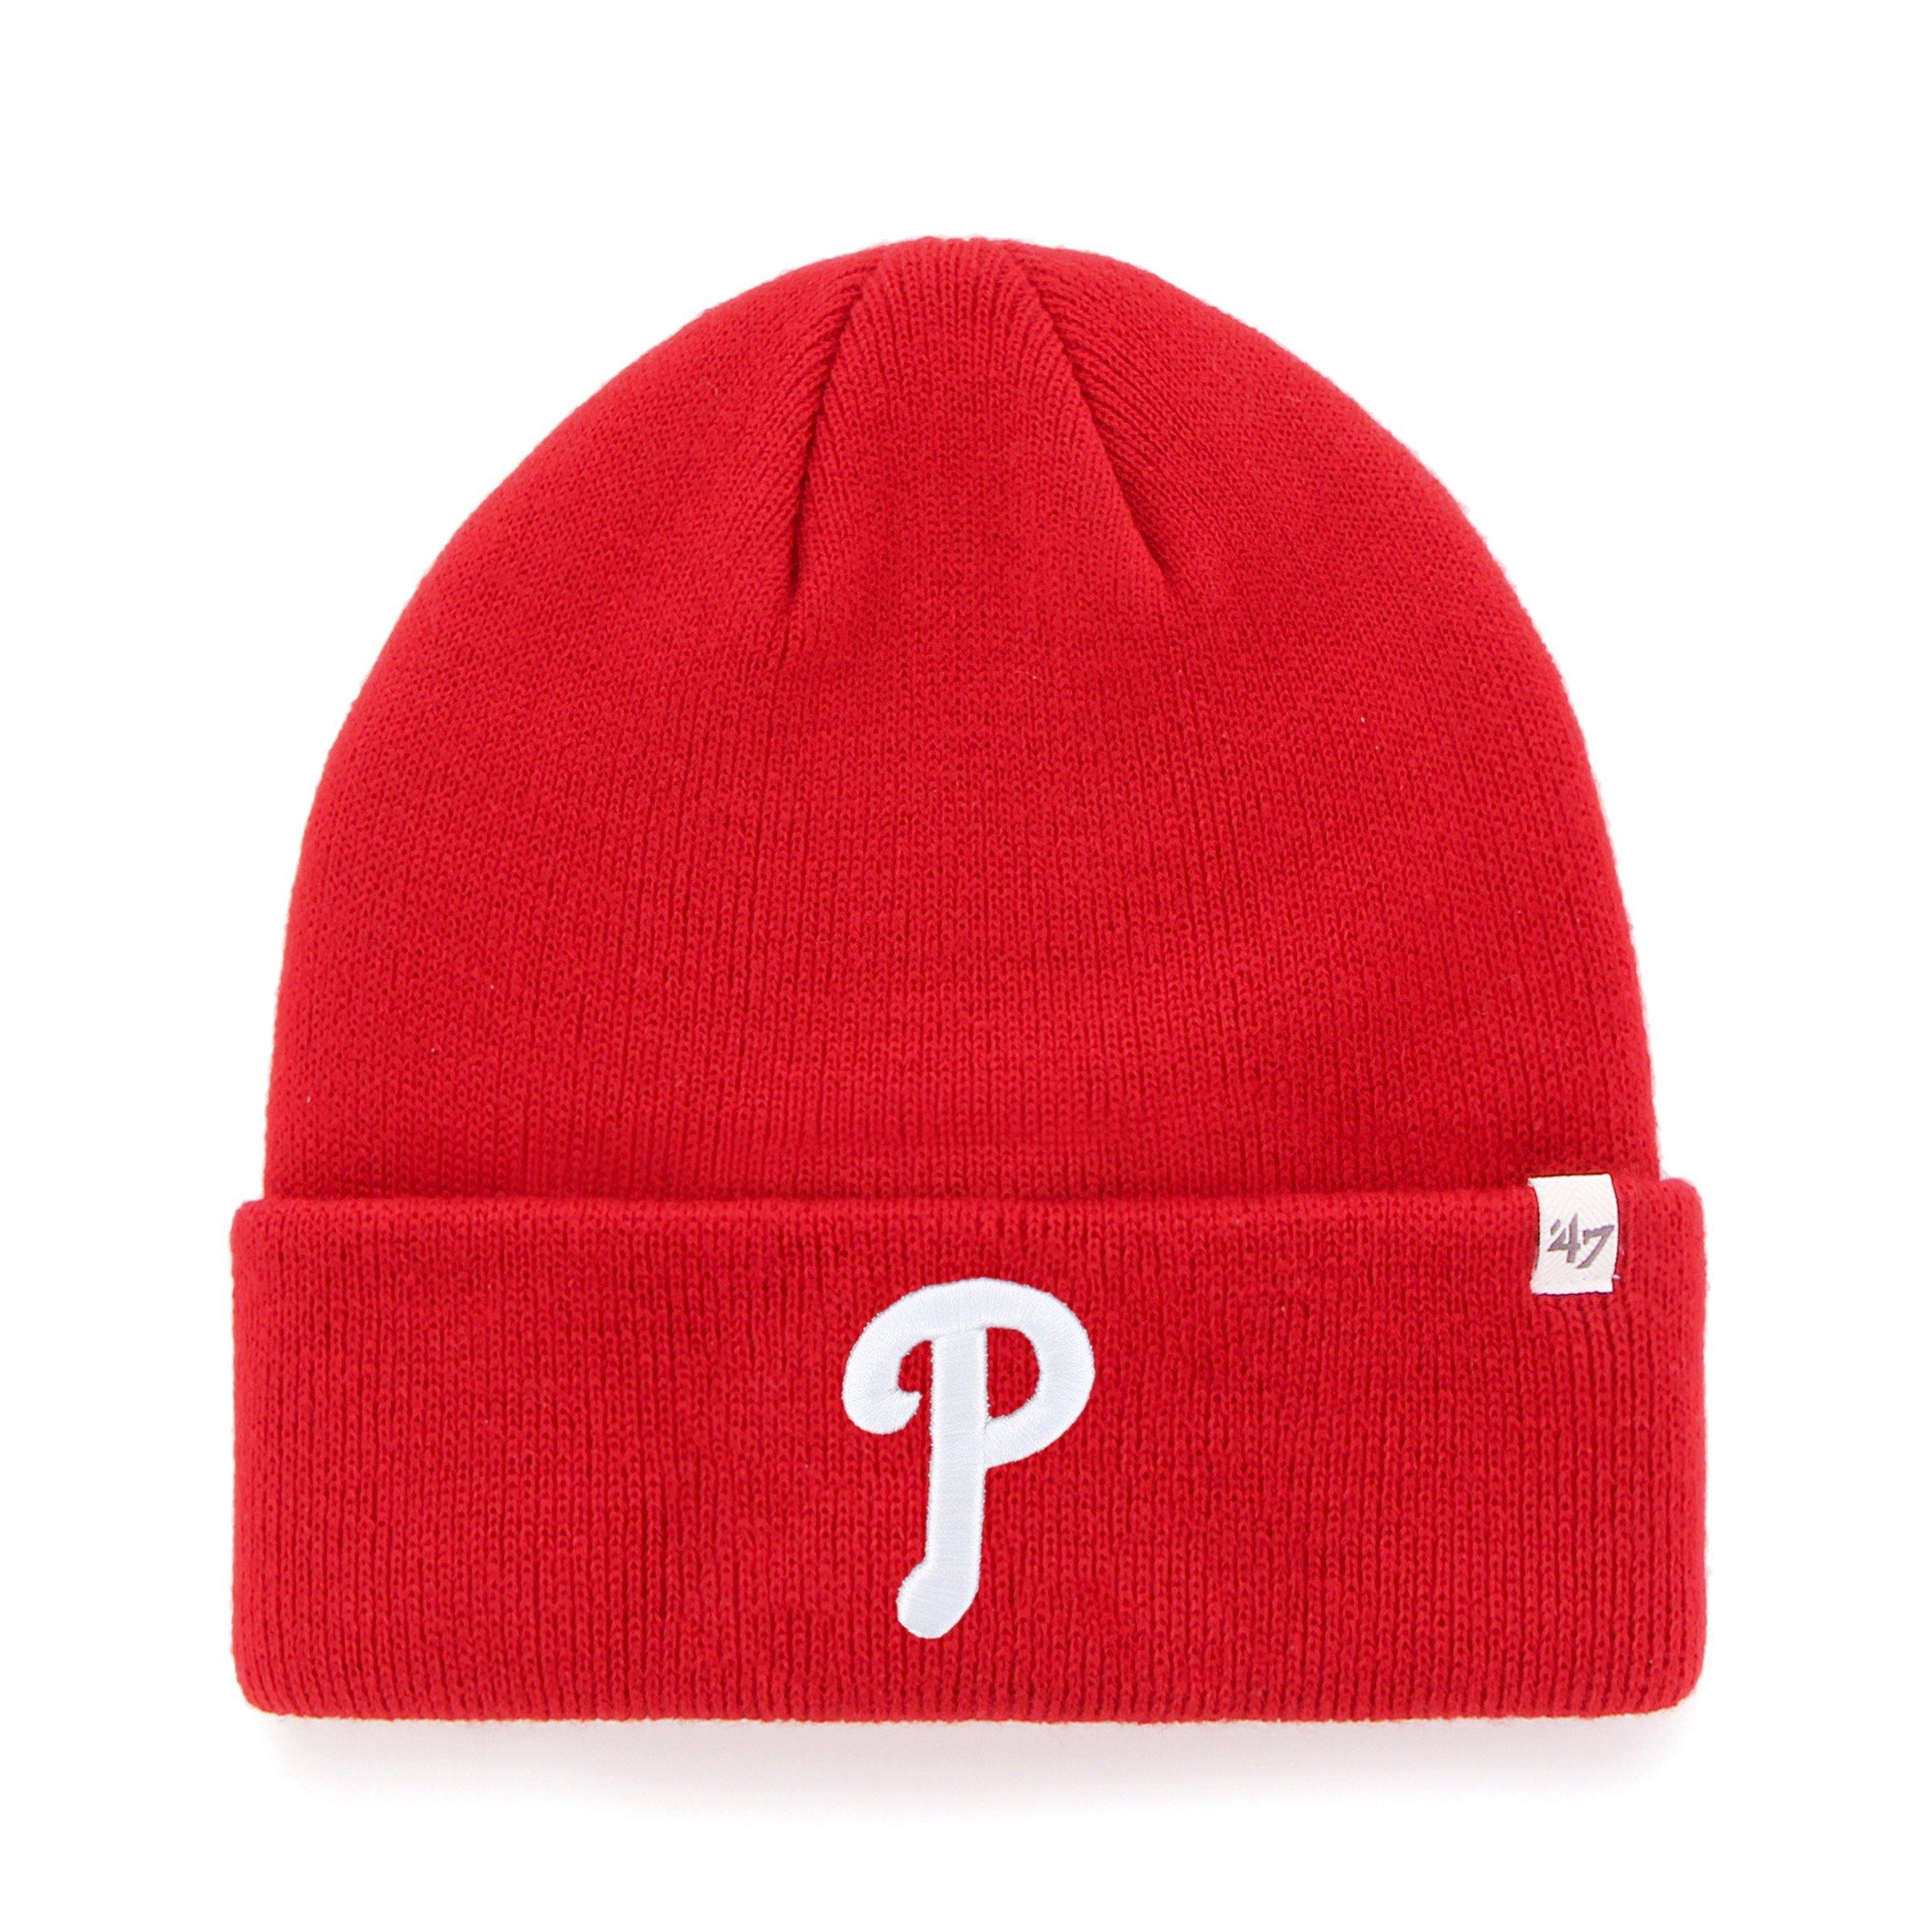 MLB Philadelphia Phillies '47 Raised Cuff Knit Hat, Red, One Size